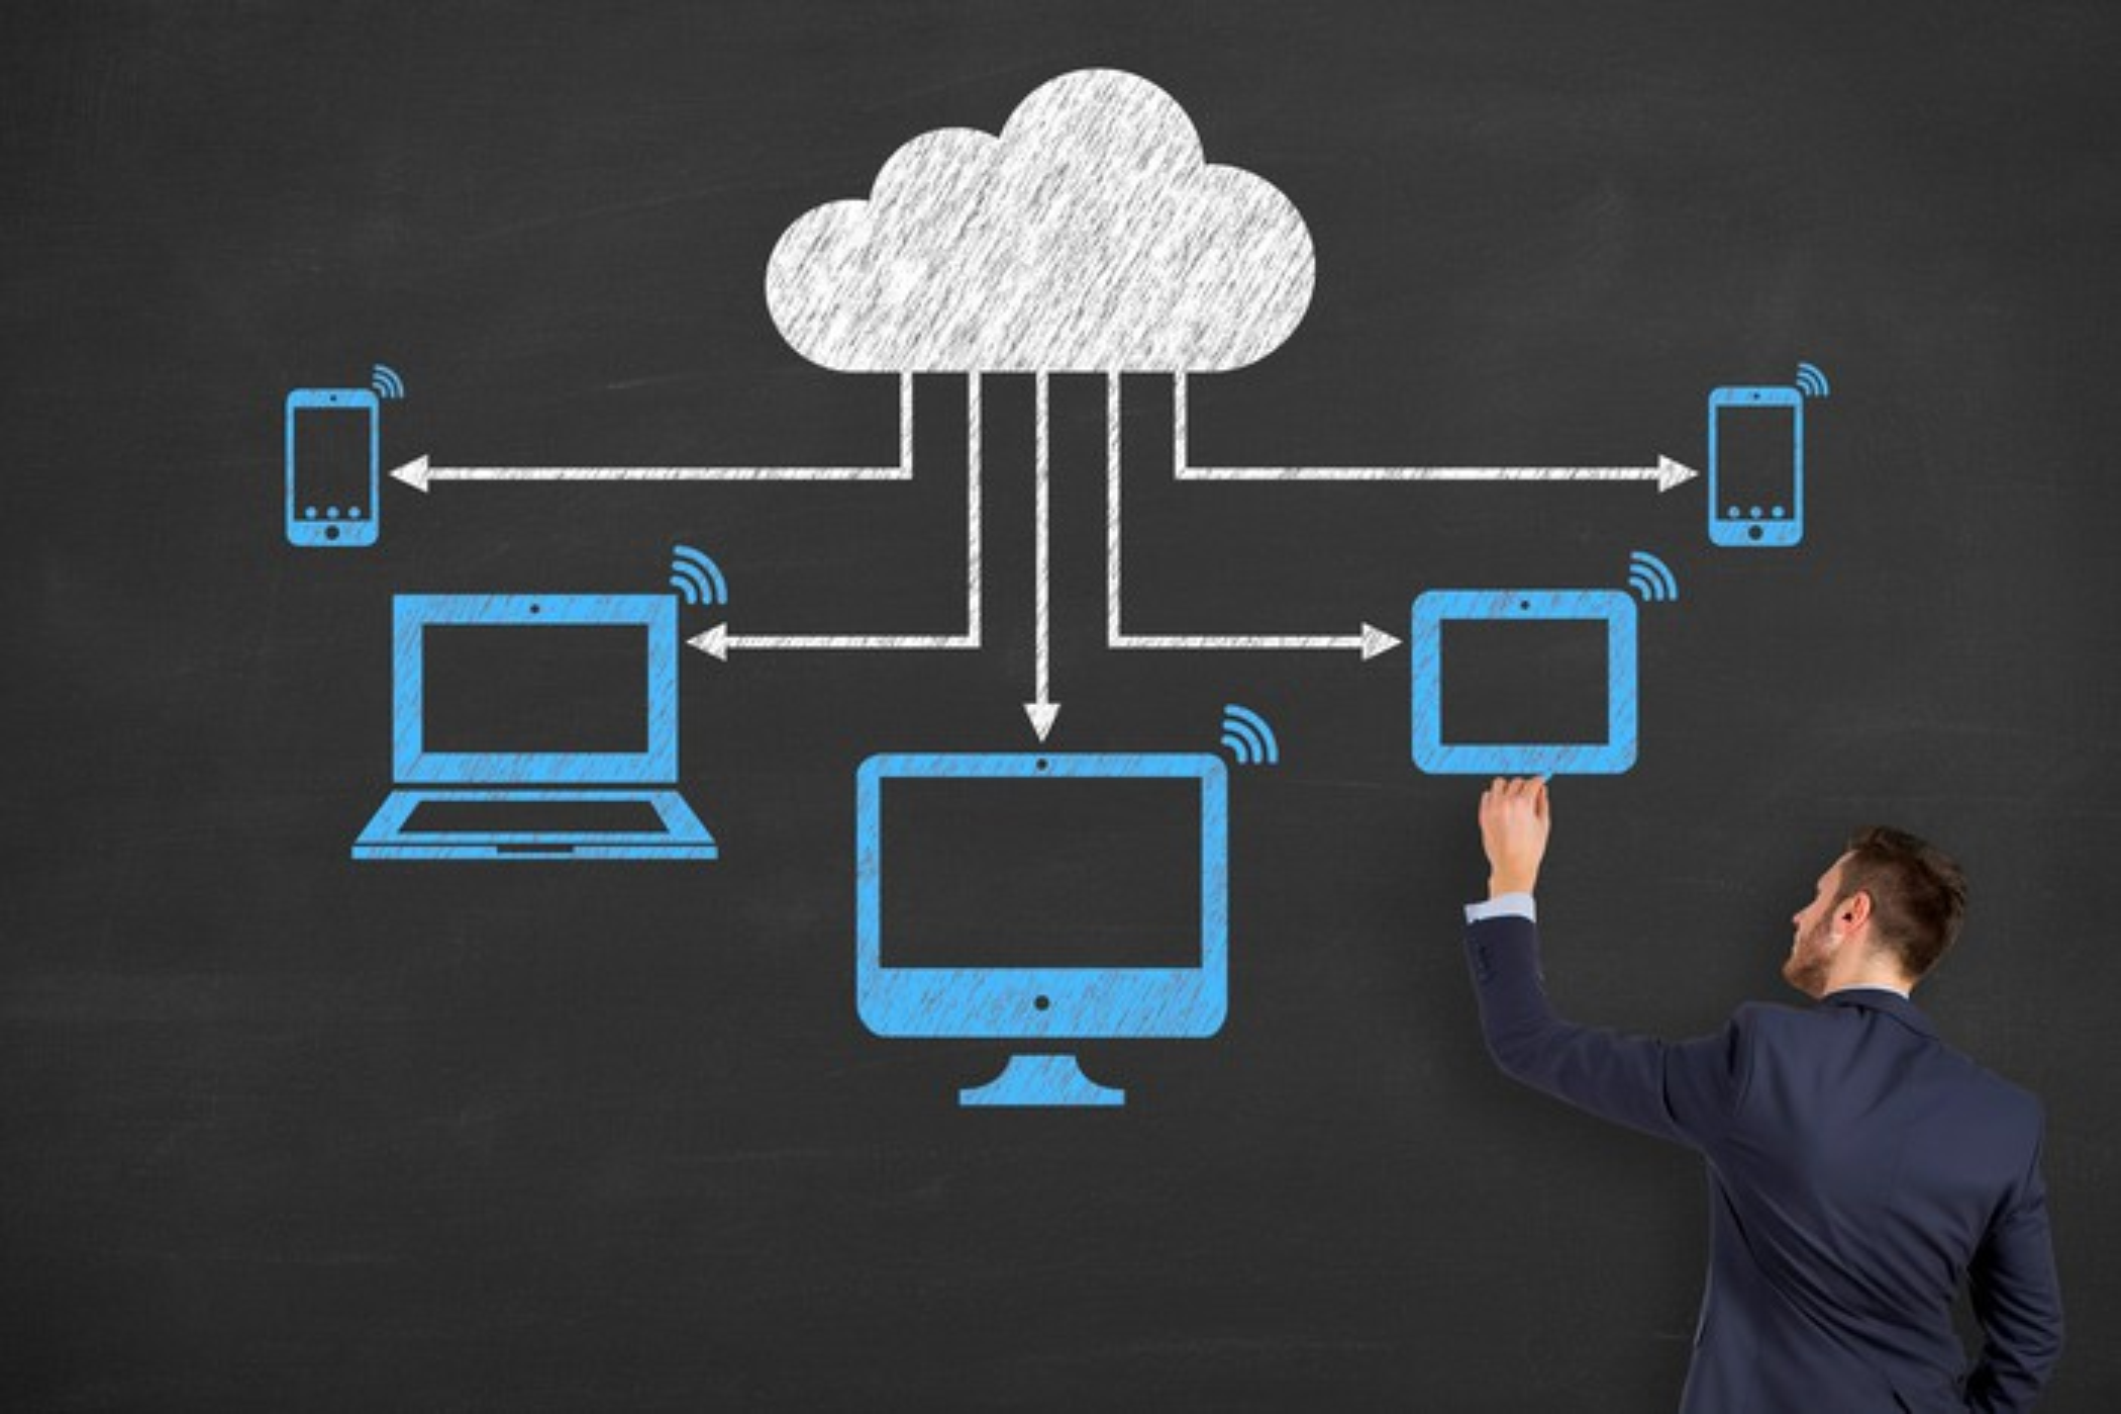 Cloud computing graphic illustration